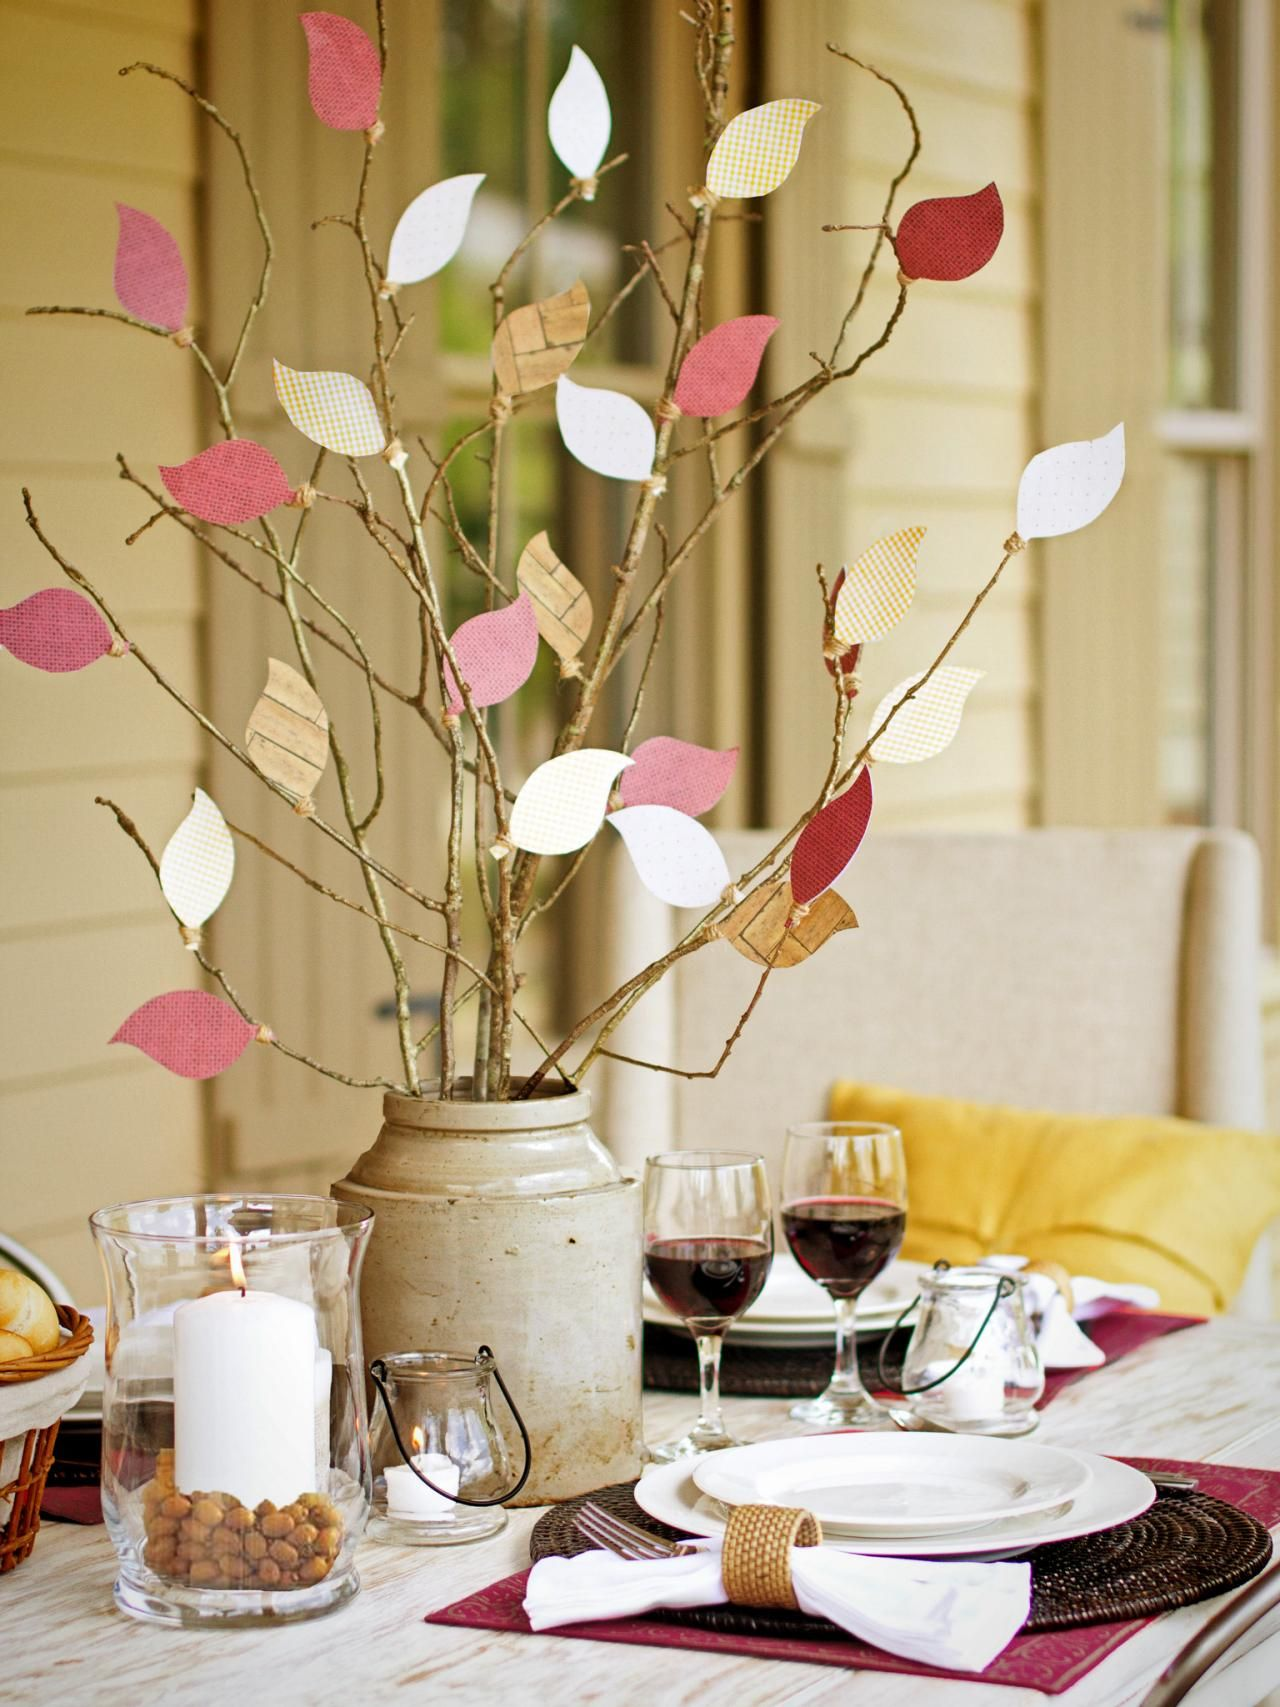 Genial 19 Fun To Make Thanksgiving Kidsu0027 Crafts | Easy Crafts And Homemade  Decorating